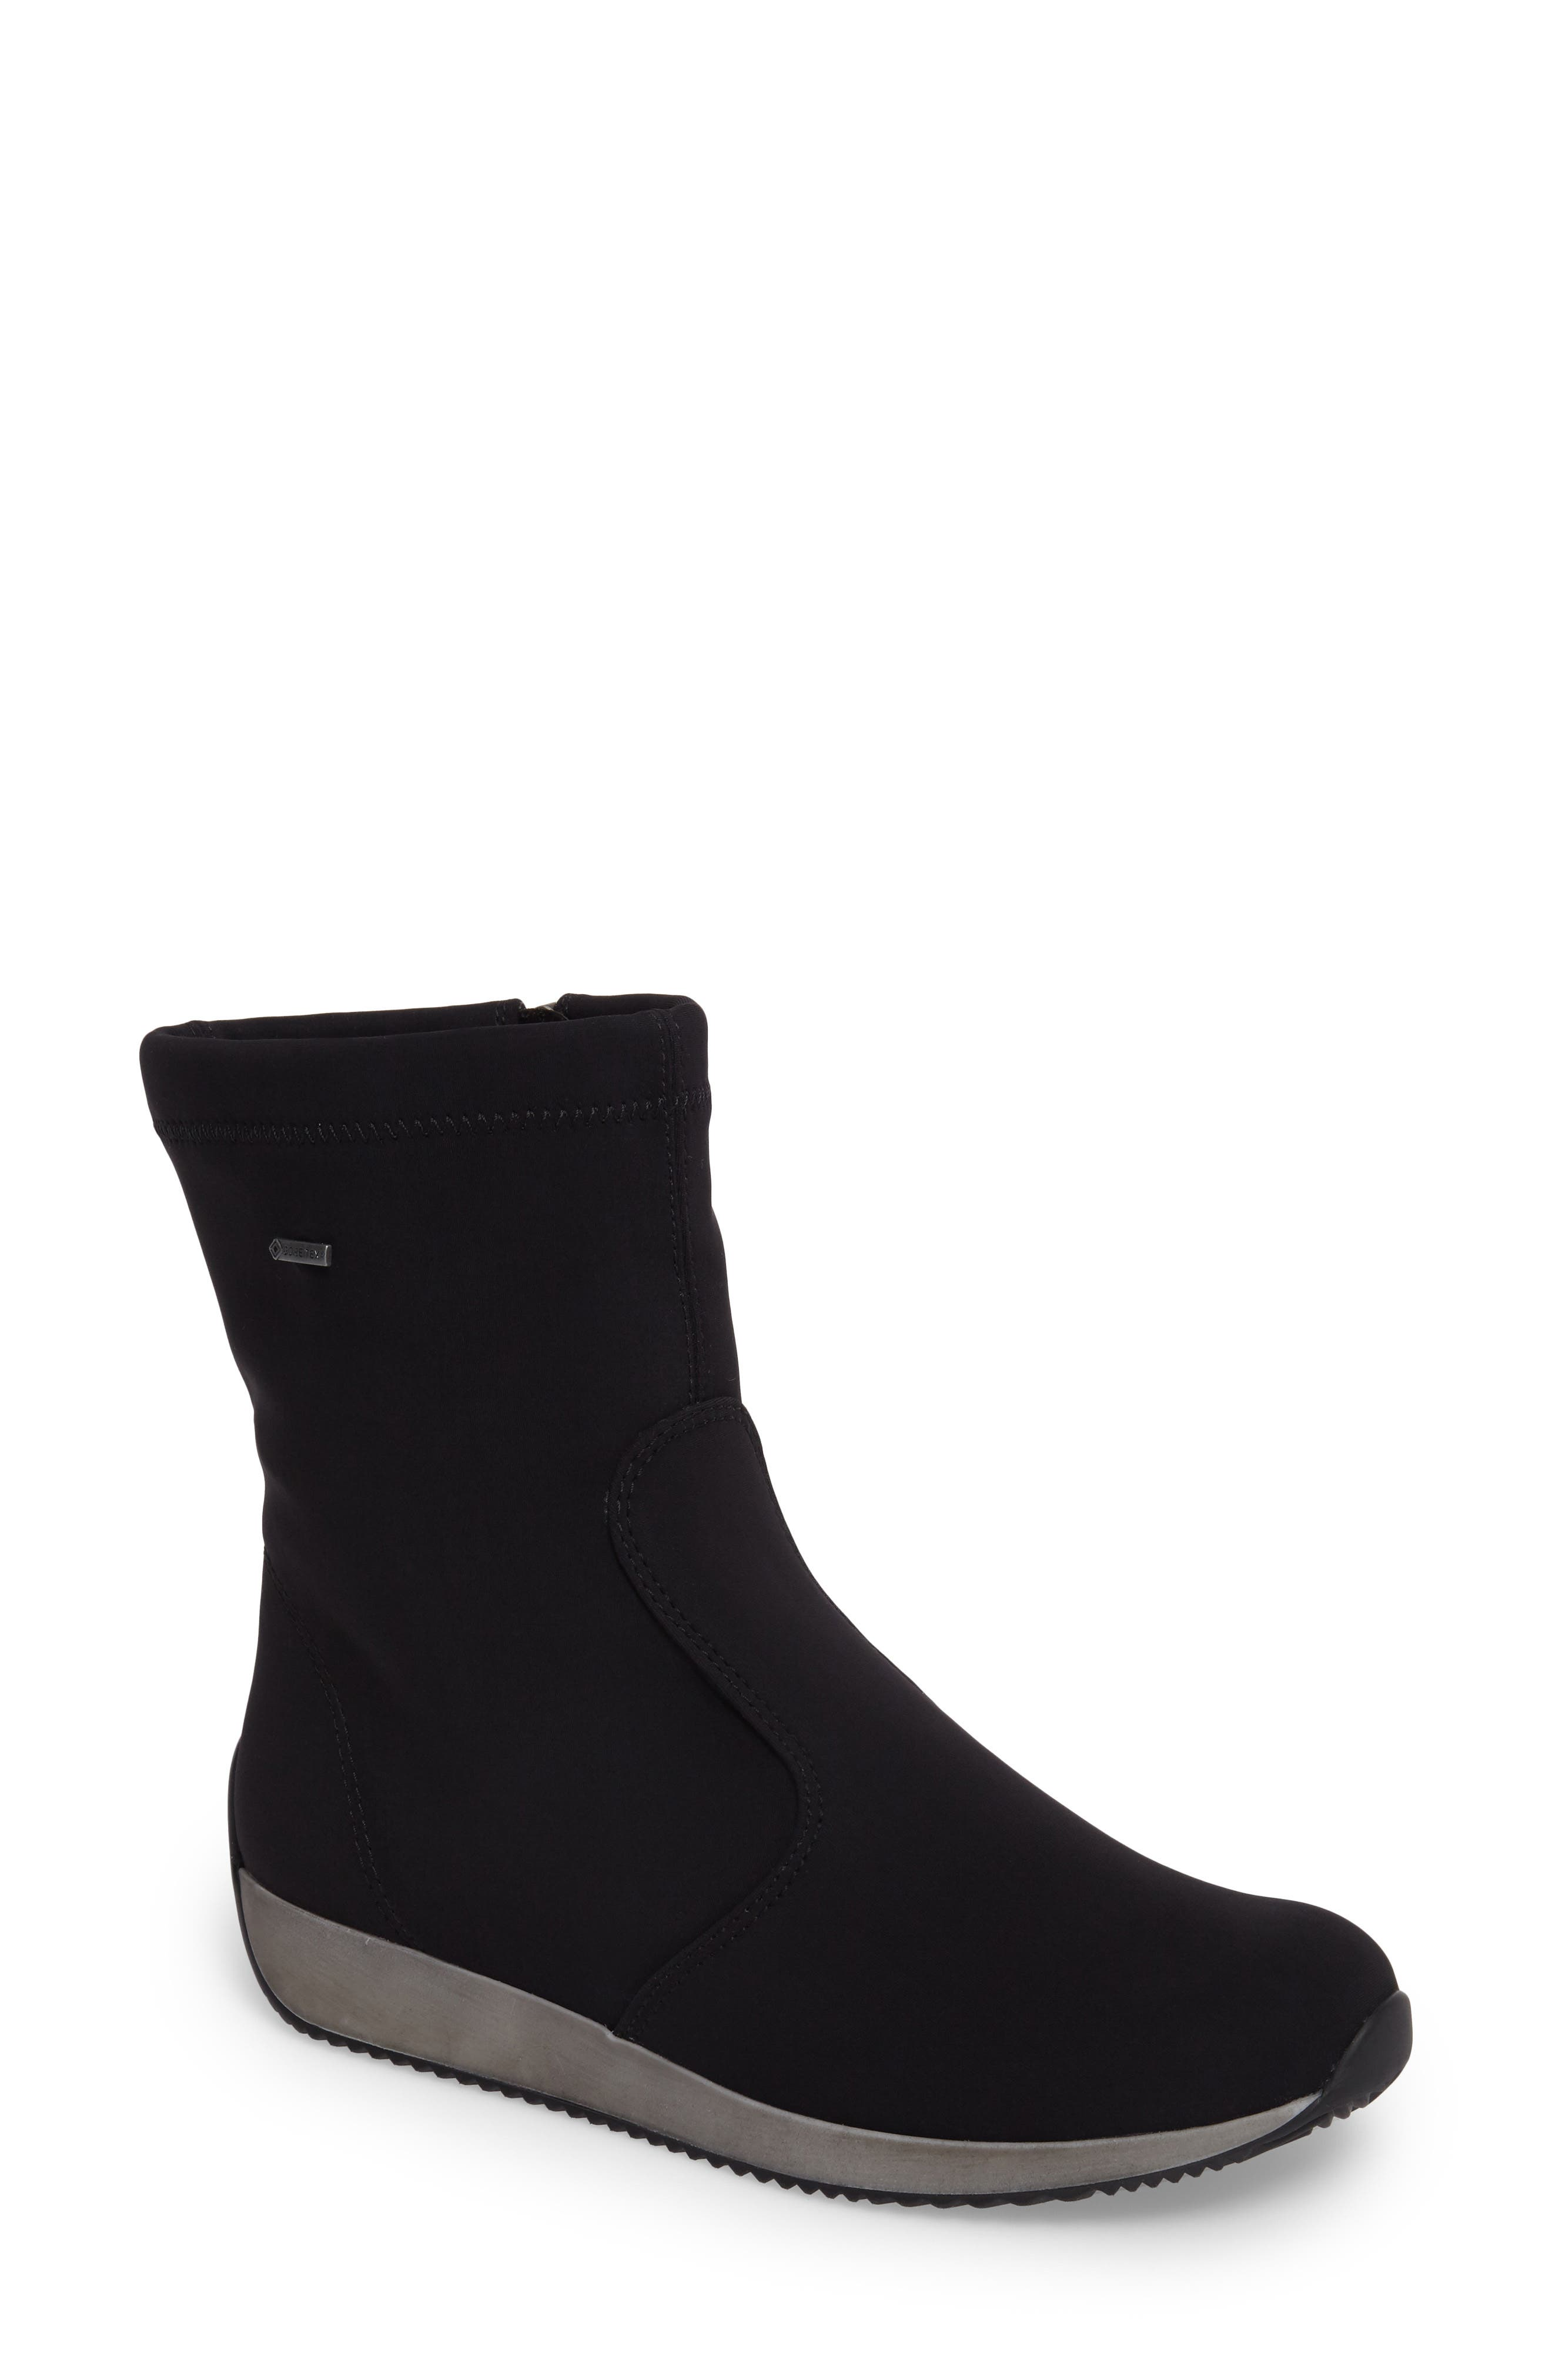 Luella Waterproof Gore-Tex<sup>®</sup> Boot,                             Main thumbnail 1, color,                             Black Textile